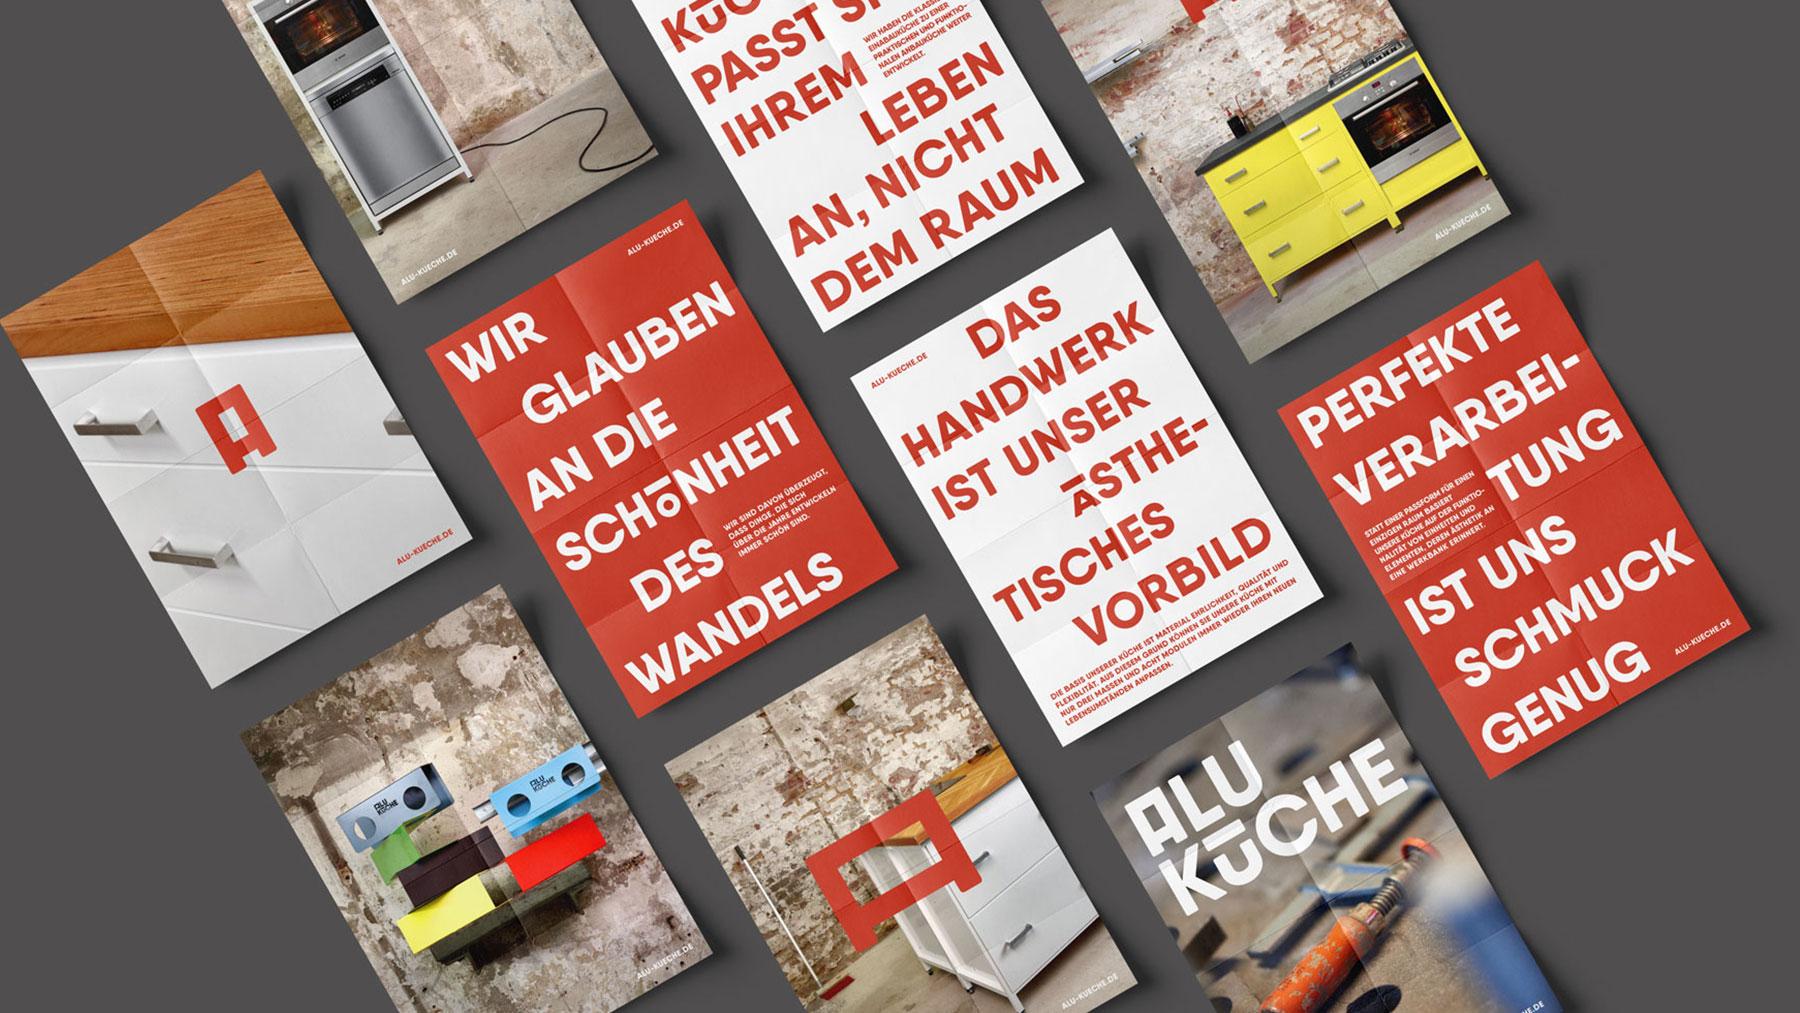 Mock_Up_Plakate_Ueberischt_b